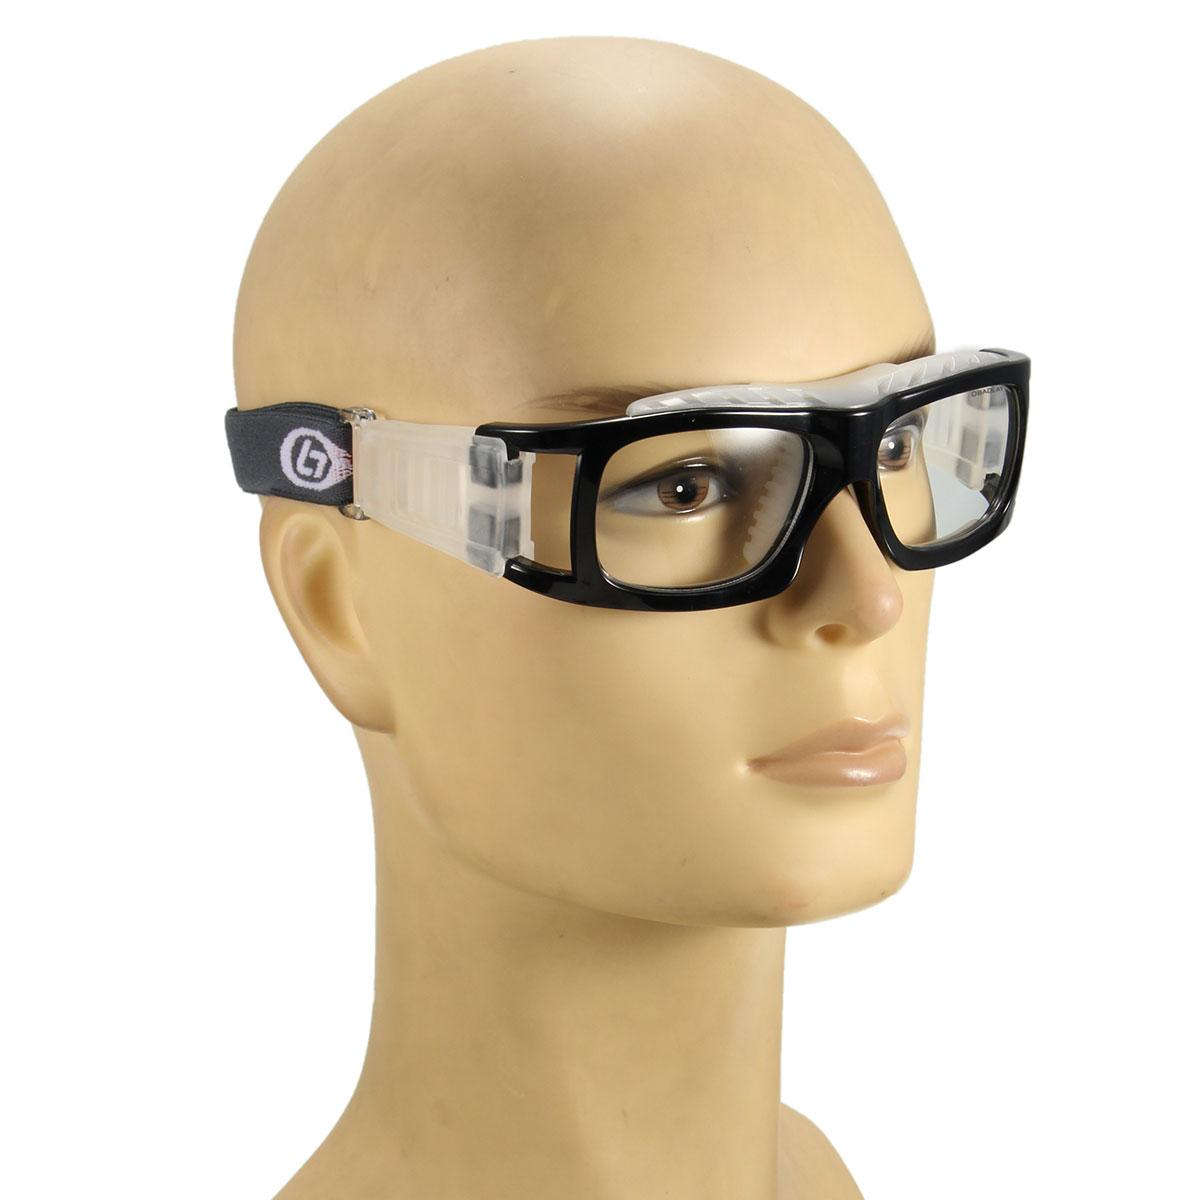 ... 4 Pcs Olahraga Sepak Bola Basket Kacamata Mata Kacamata Pengaman Pelindung Elastis Hitam-Intl ...